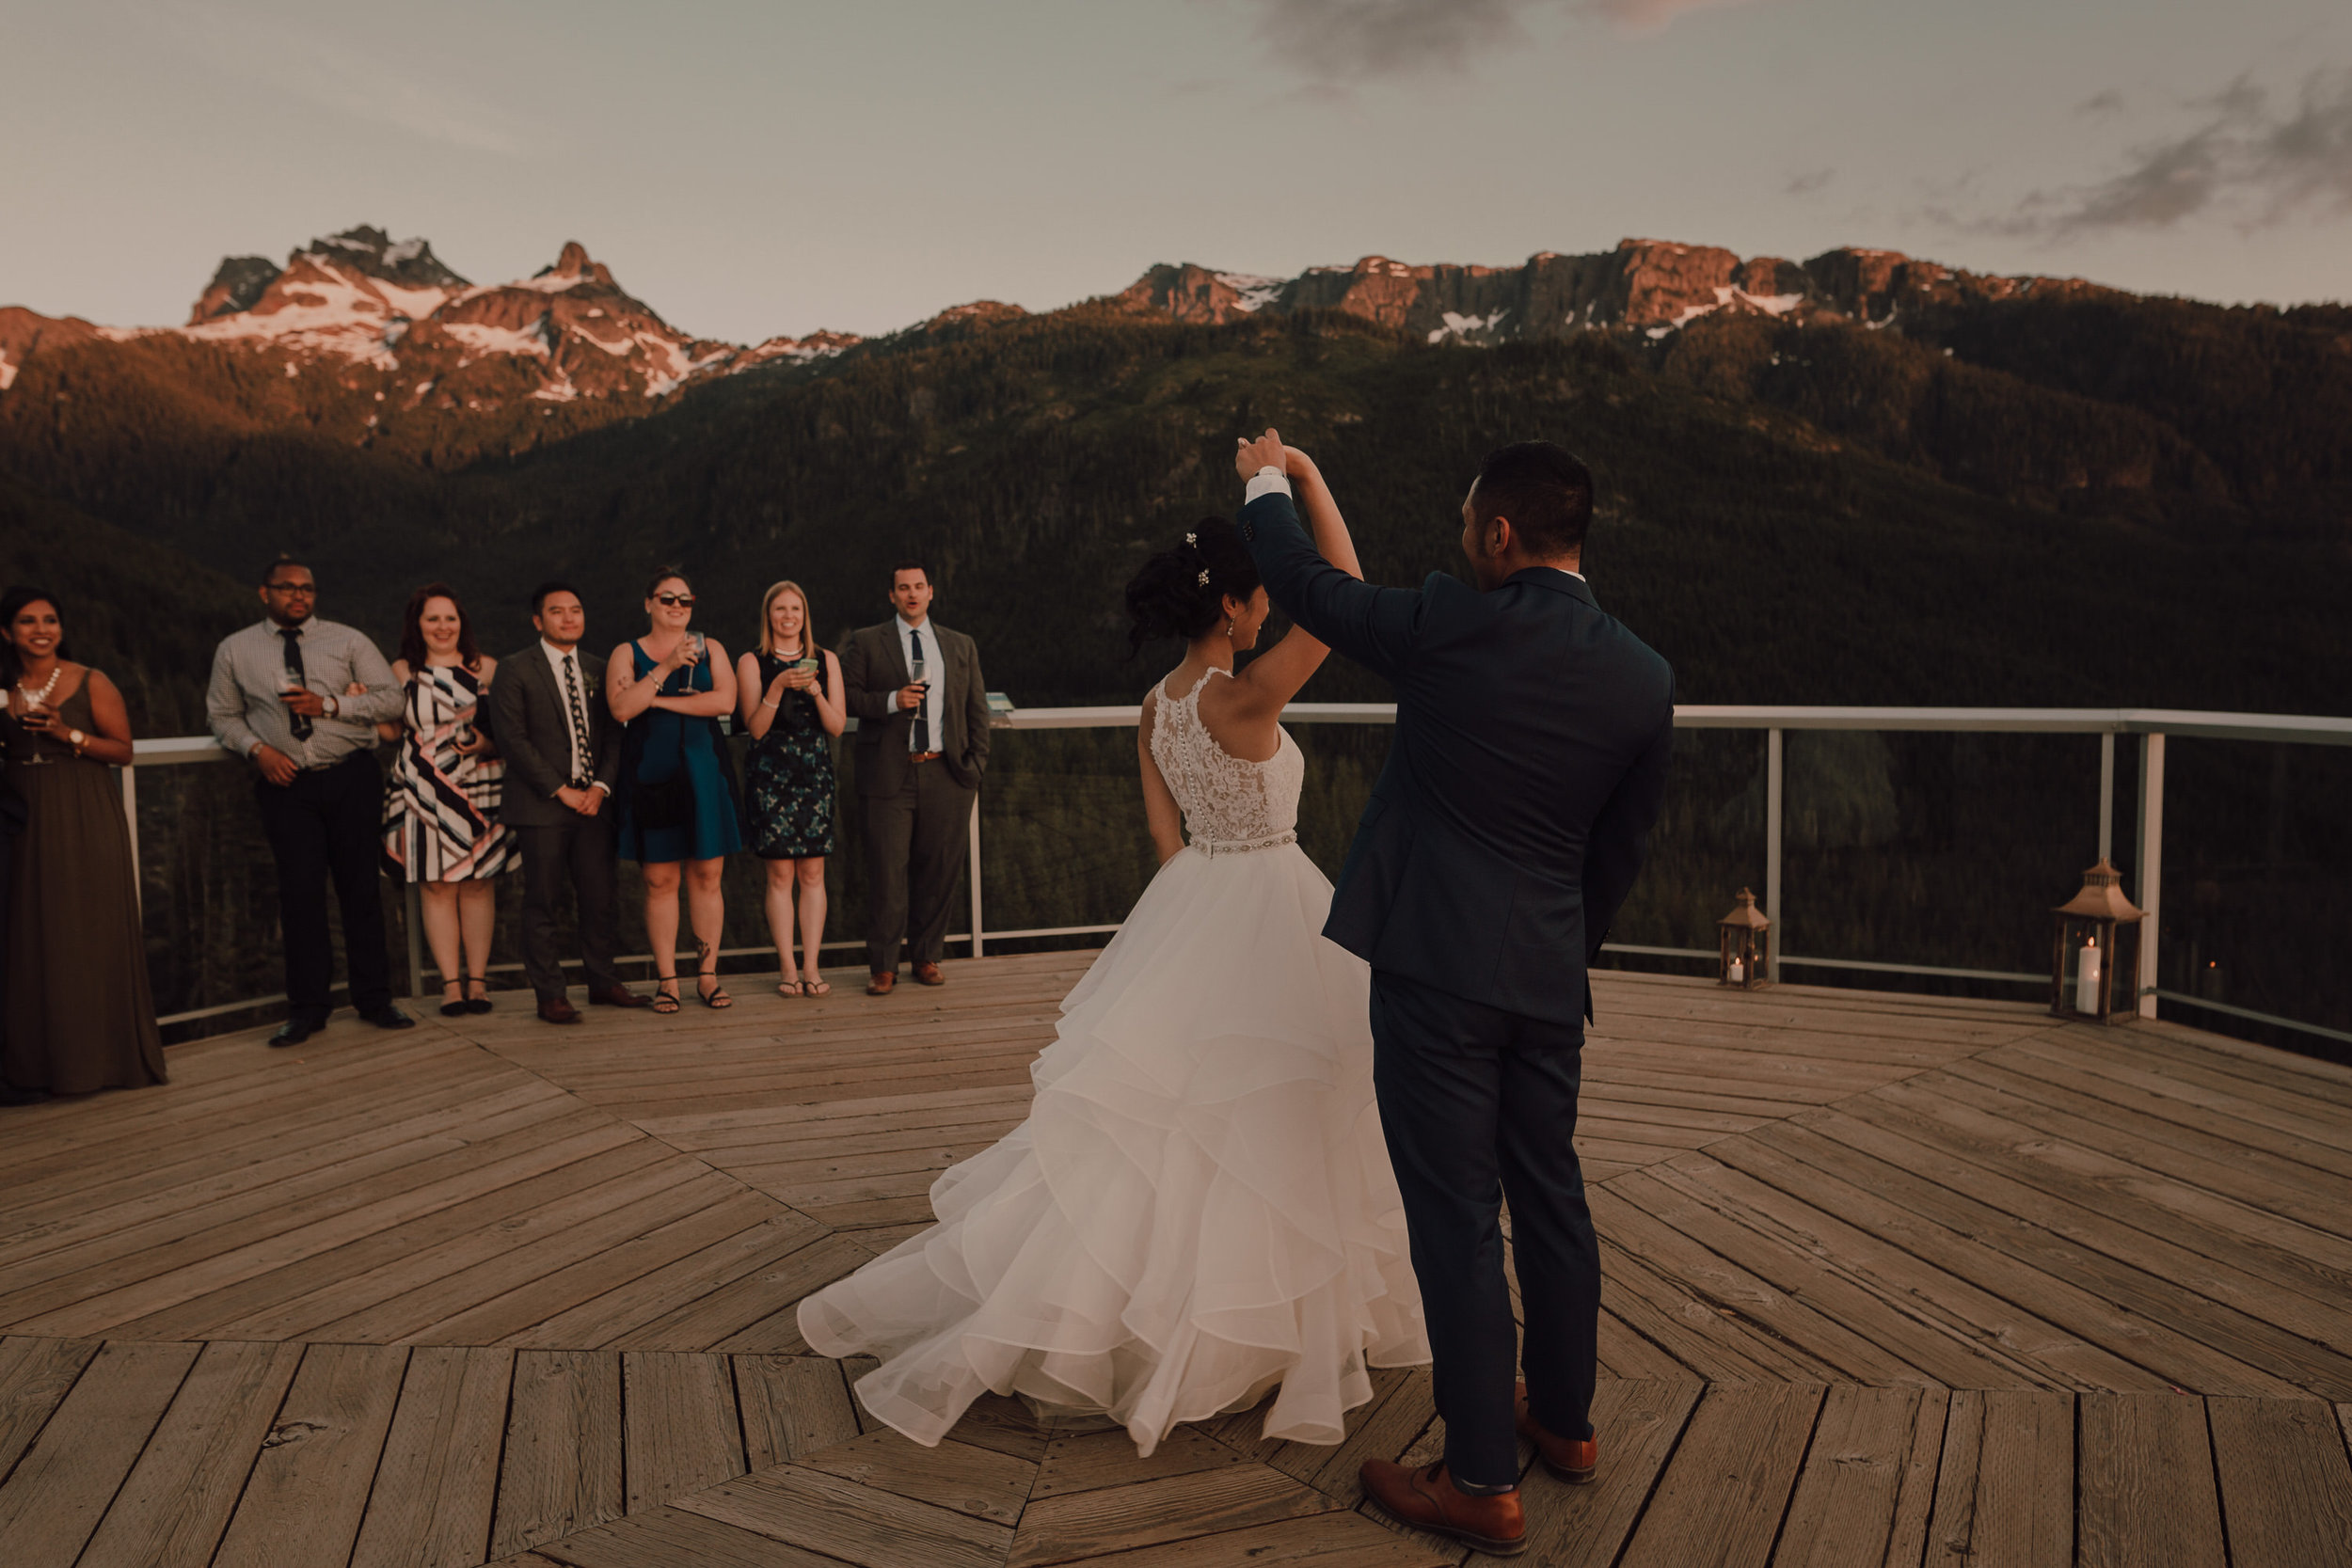 Squamish Wedding Photographer - Sea to Sky Gondola Wedding Photos -  Vancouver Wedding Photographer & Videographer - Sunshine Coast Wedding Photos - Sunshine Coast Wedding Photographer - Jennifer Picard Photography - IMG_5463 (1).jpg